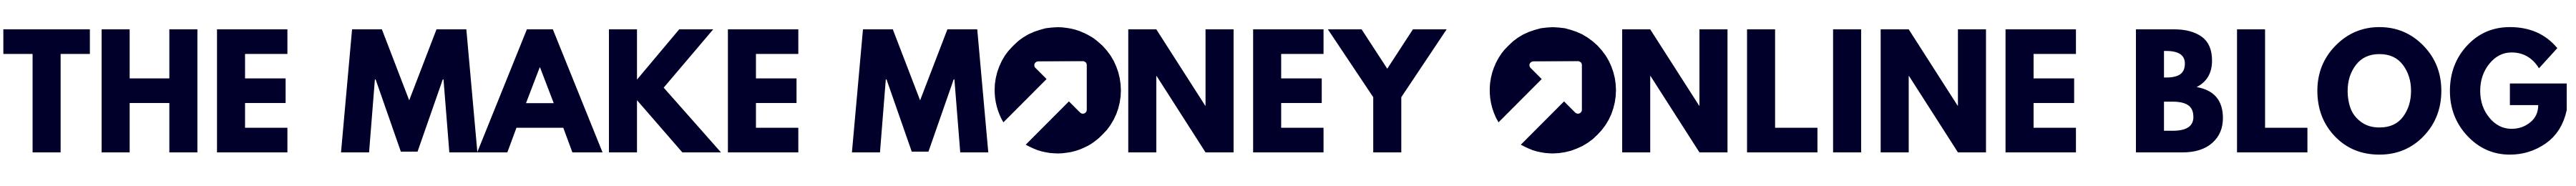 The Make Money Online Blog